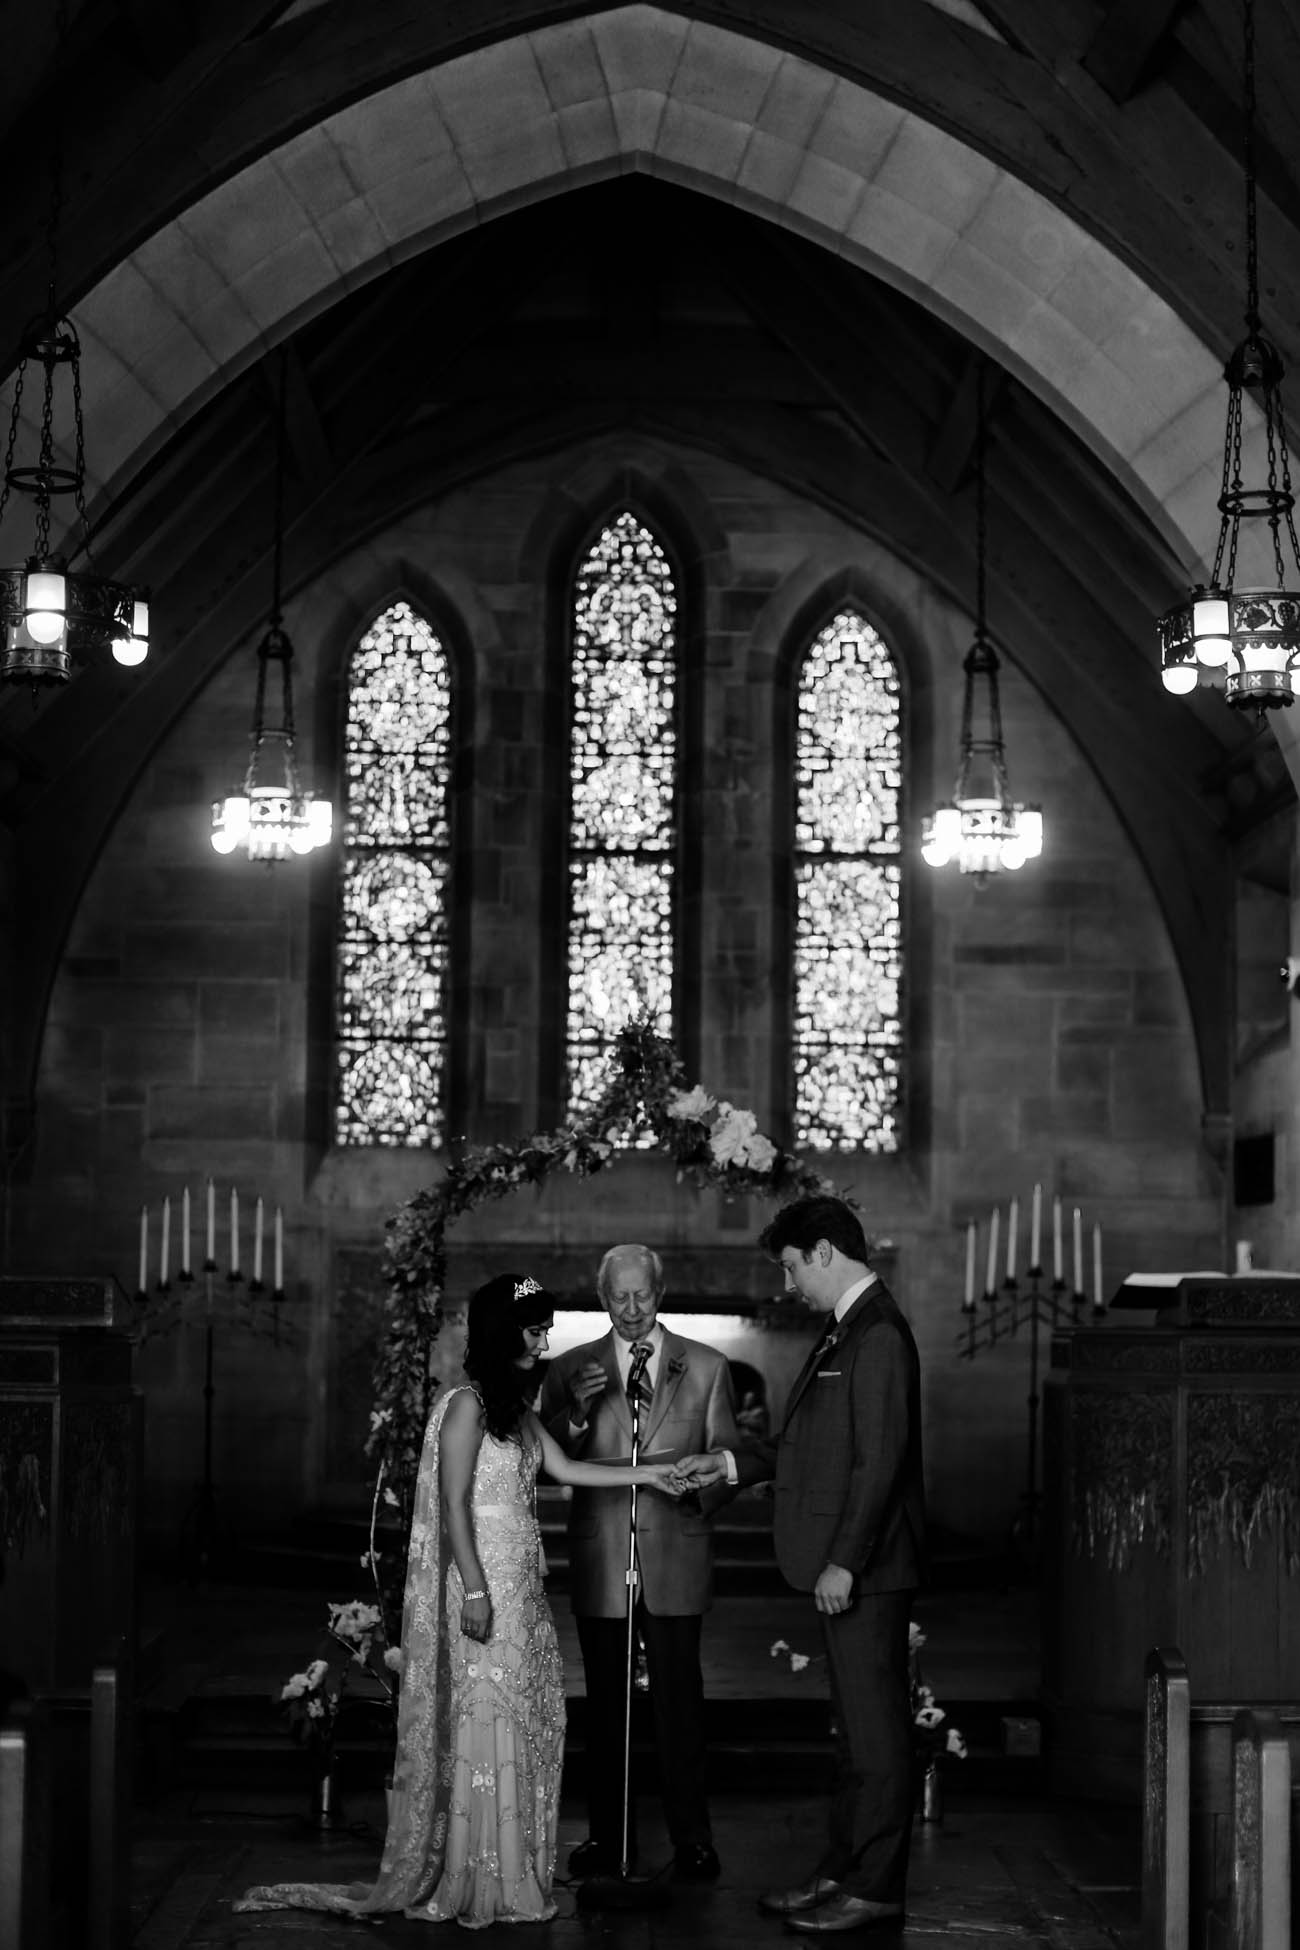 Speakeasy-1920s-theme-Louisville-and-Lexington Wedding-206.jpg